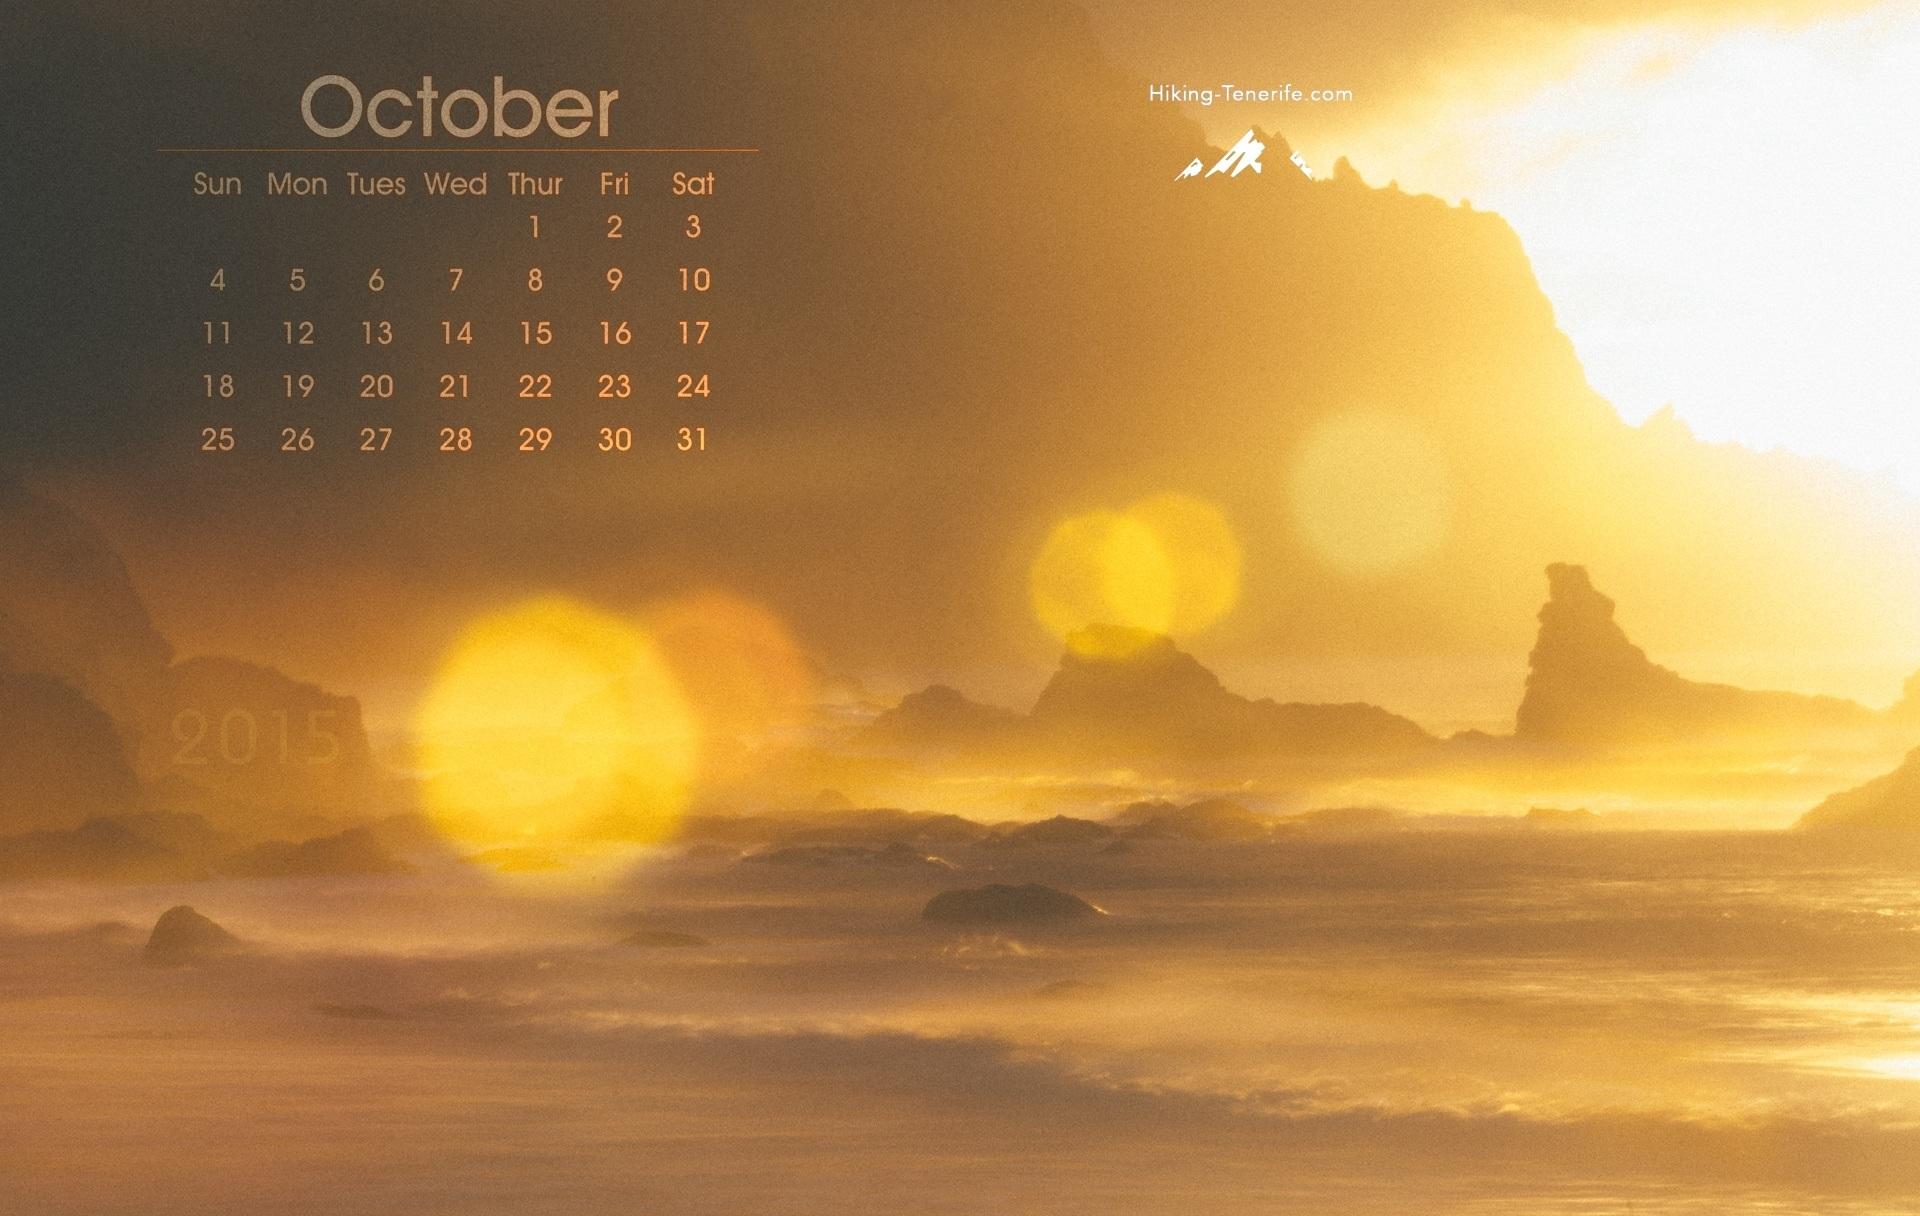 Заставка октябрь на рабочий стол (10)